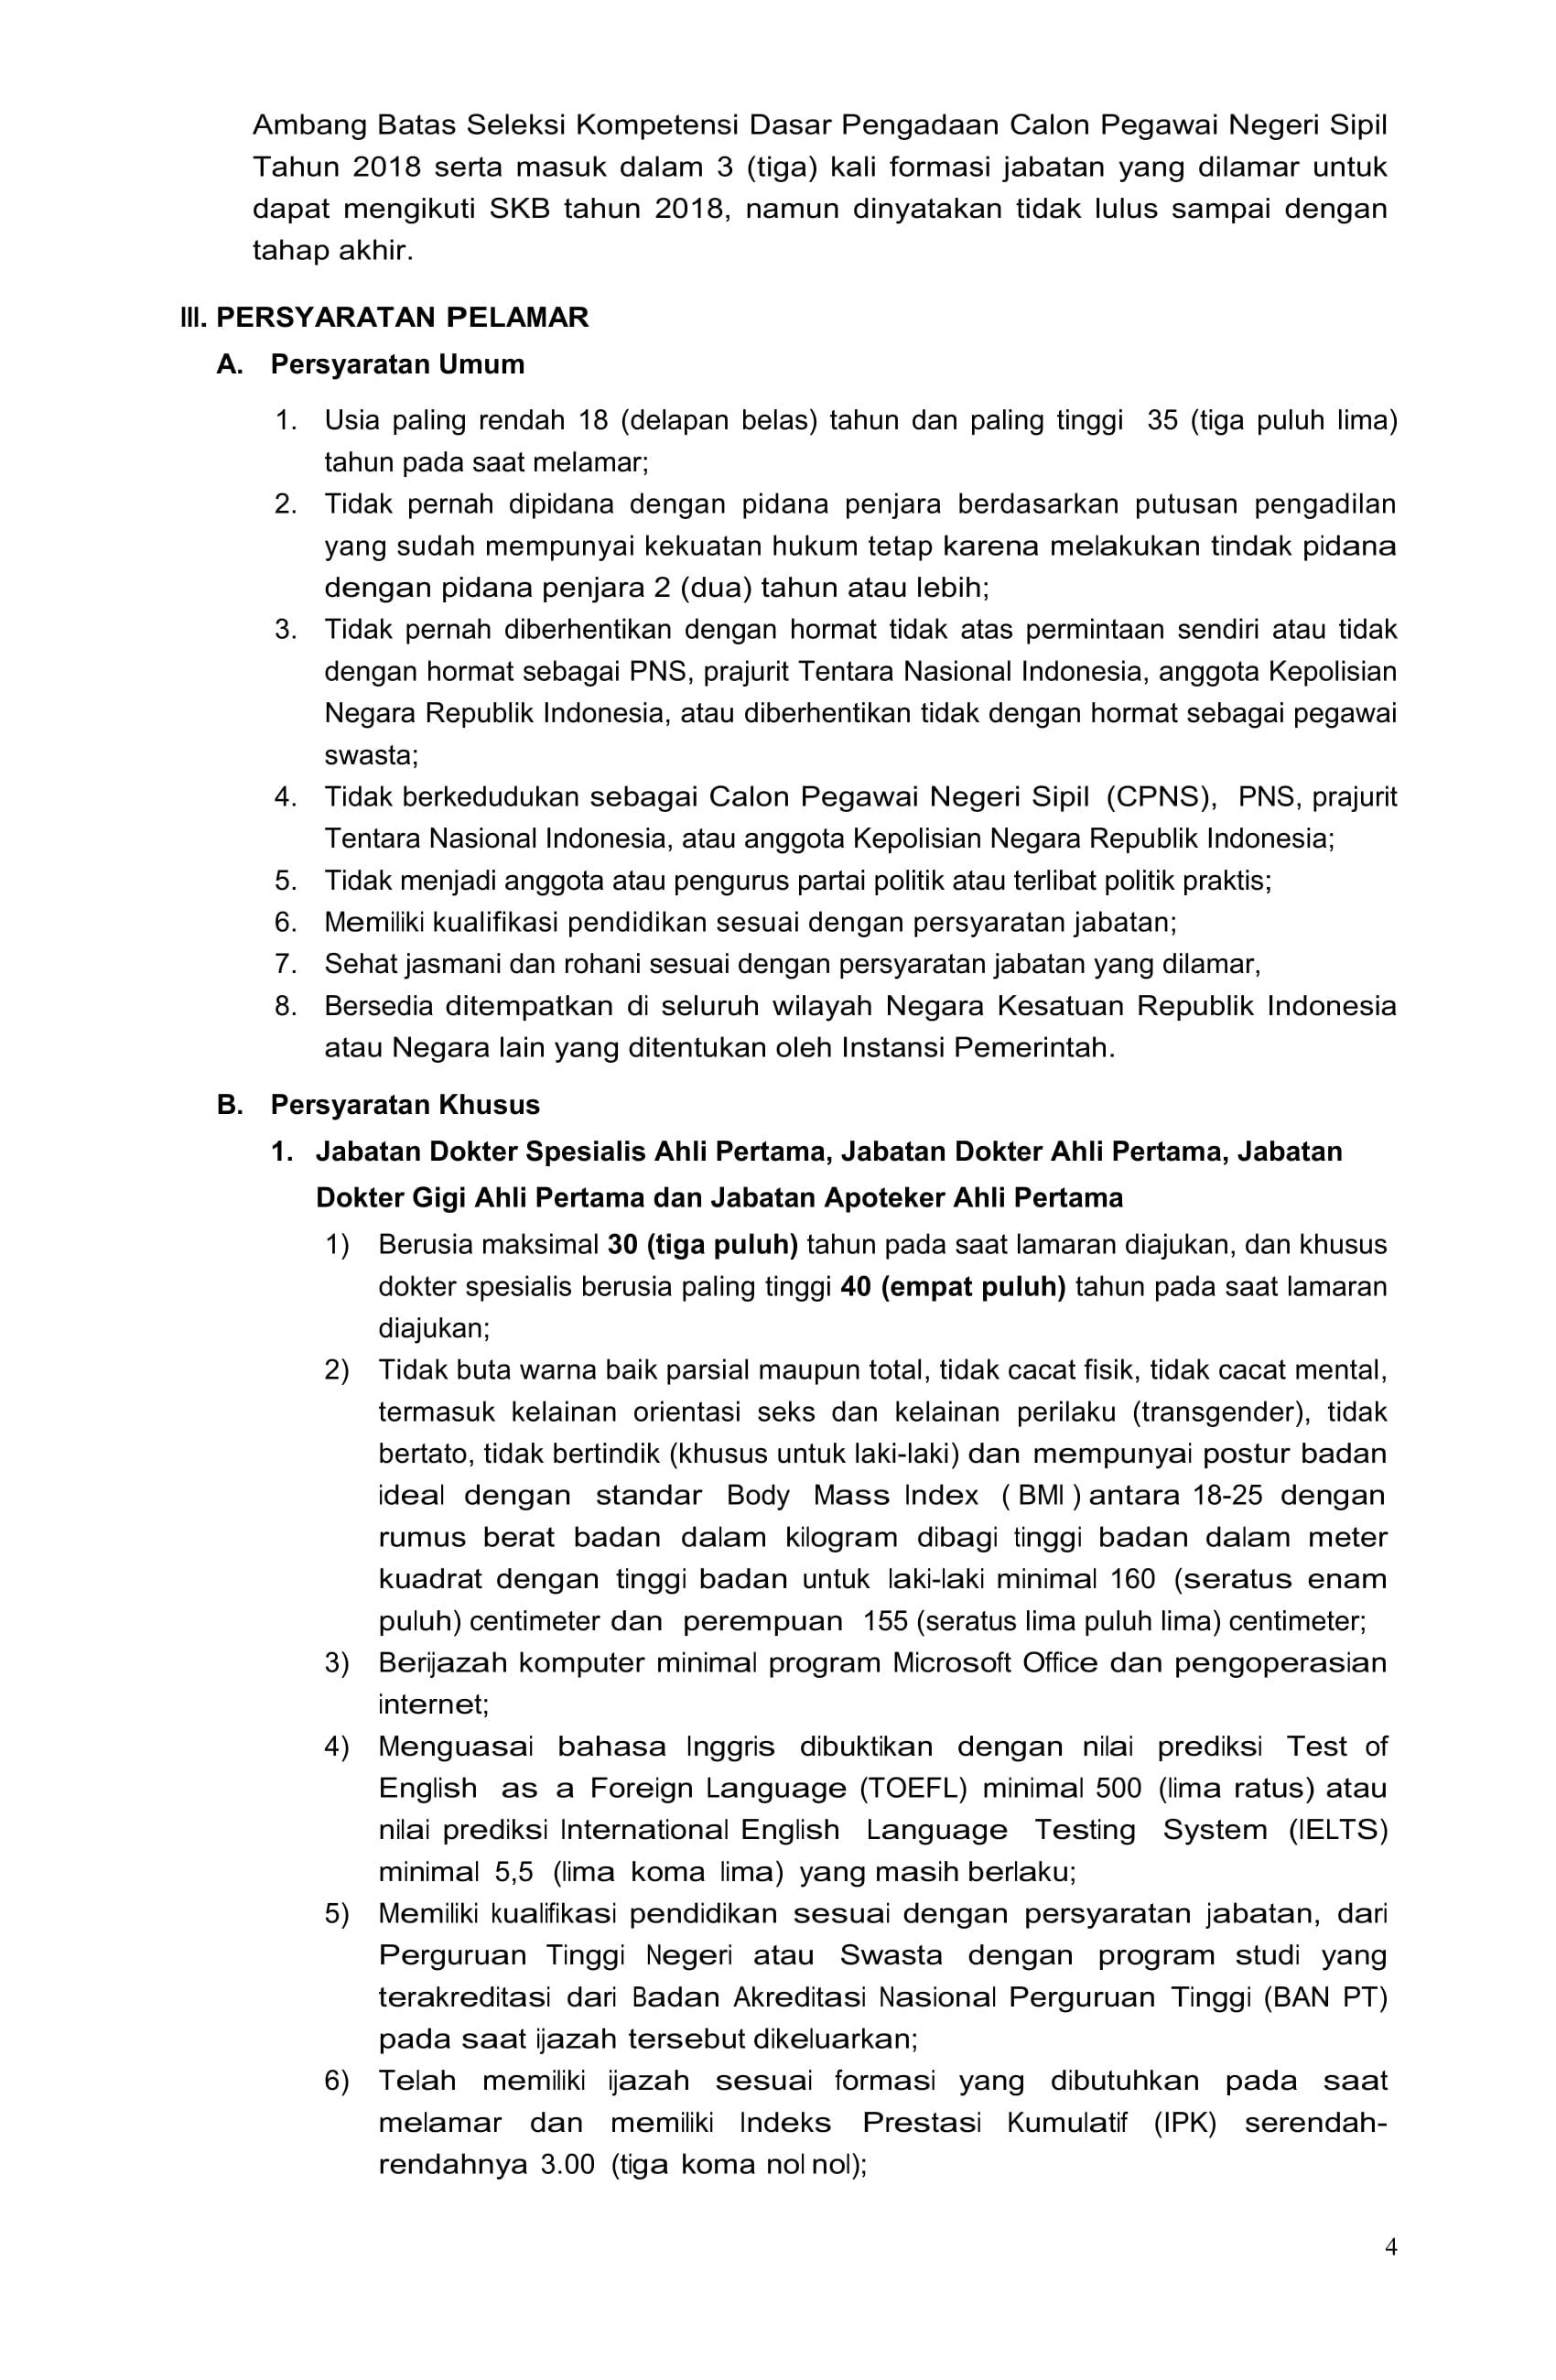 PENGUMUMAN PENGADAAN CPNS KEJAKSAAN RI 2019-07